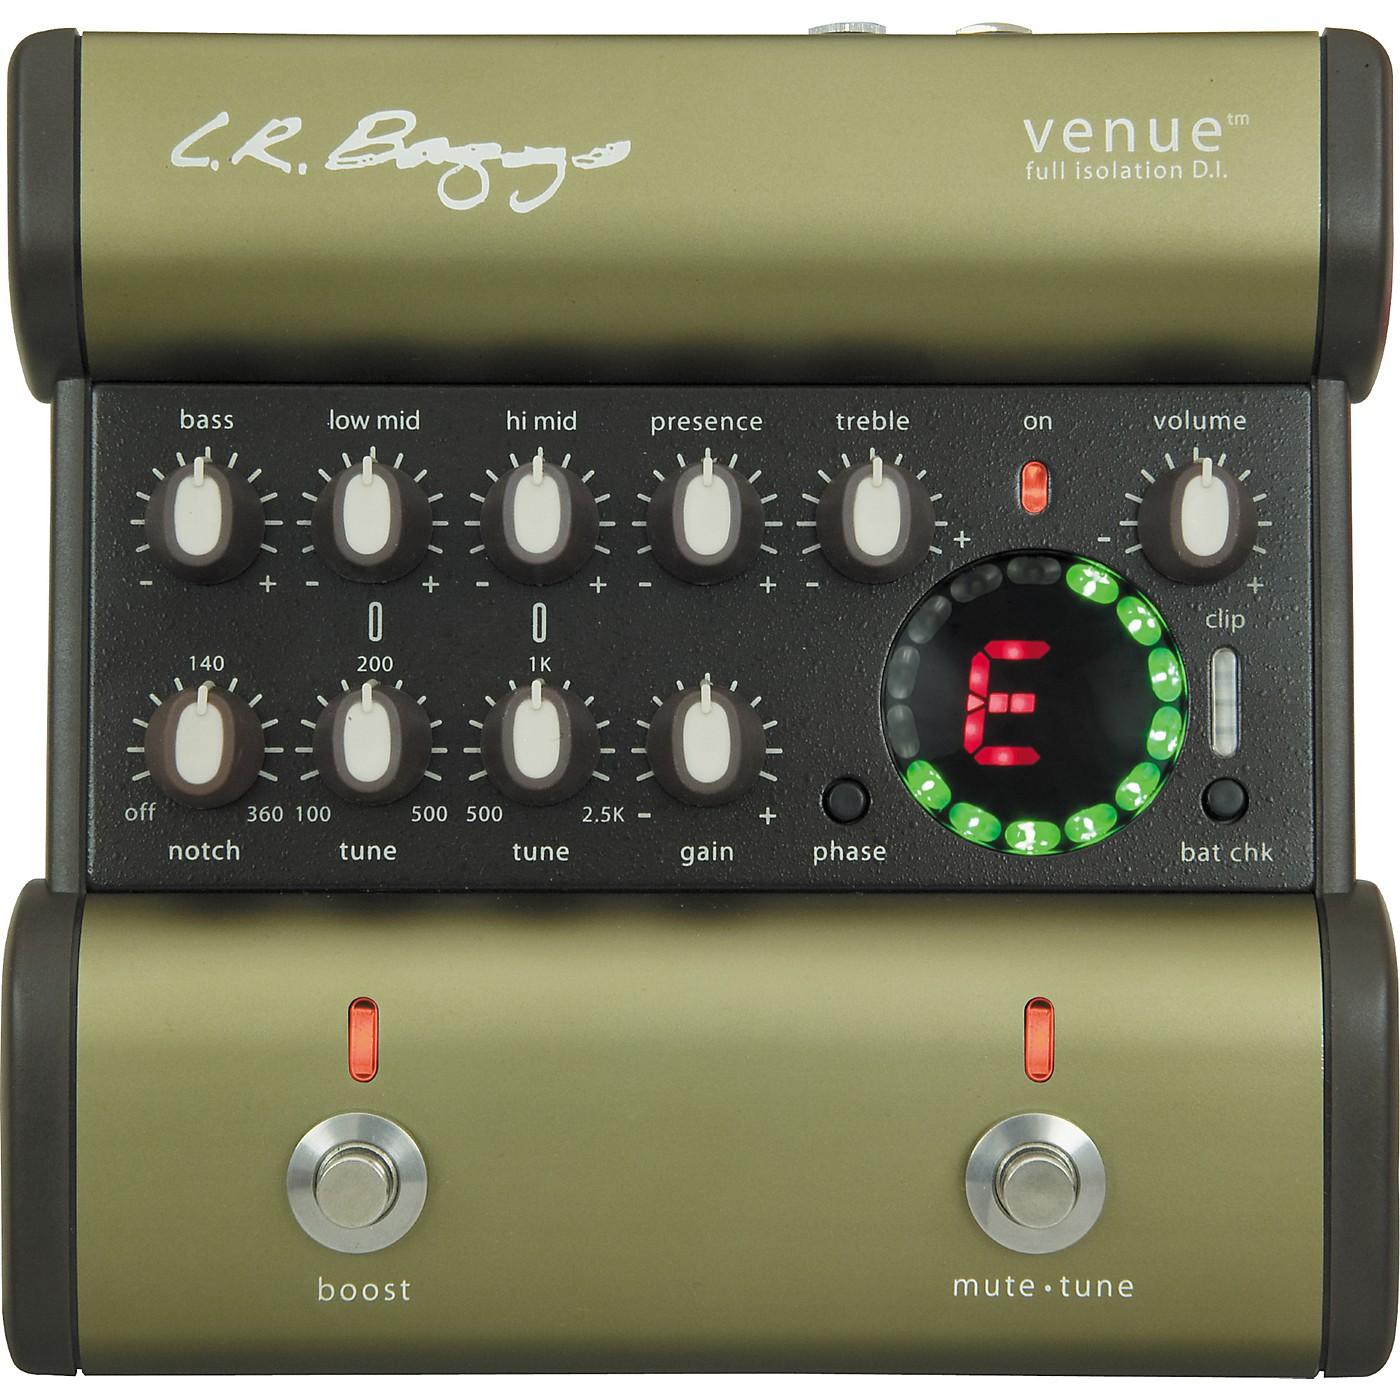 LR Baggs Venue DI Acoustic Guitar Direct Box and Preamp thumbnail